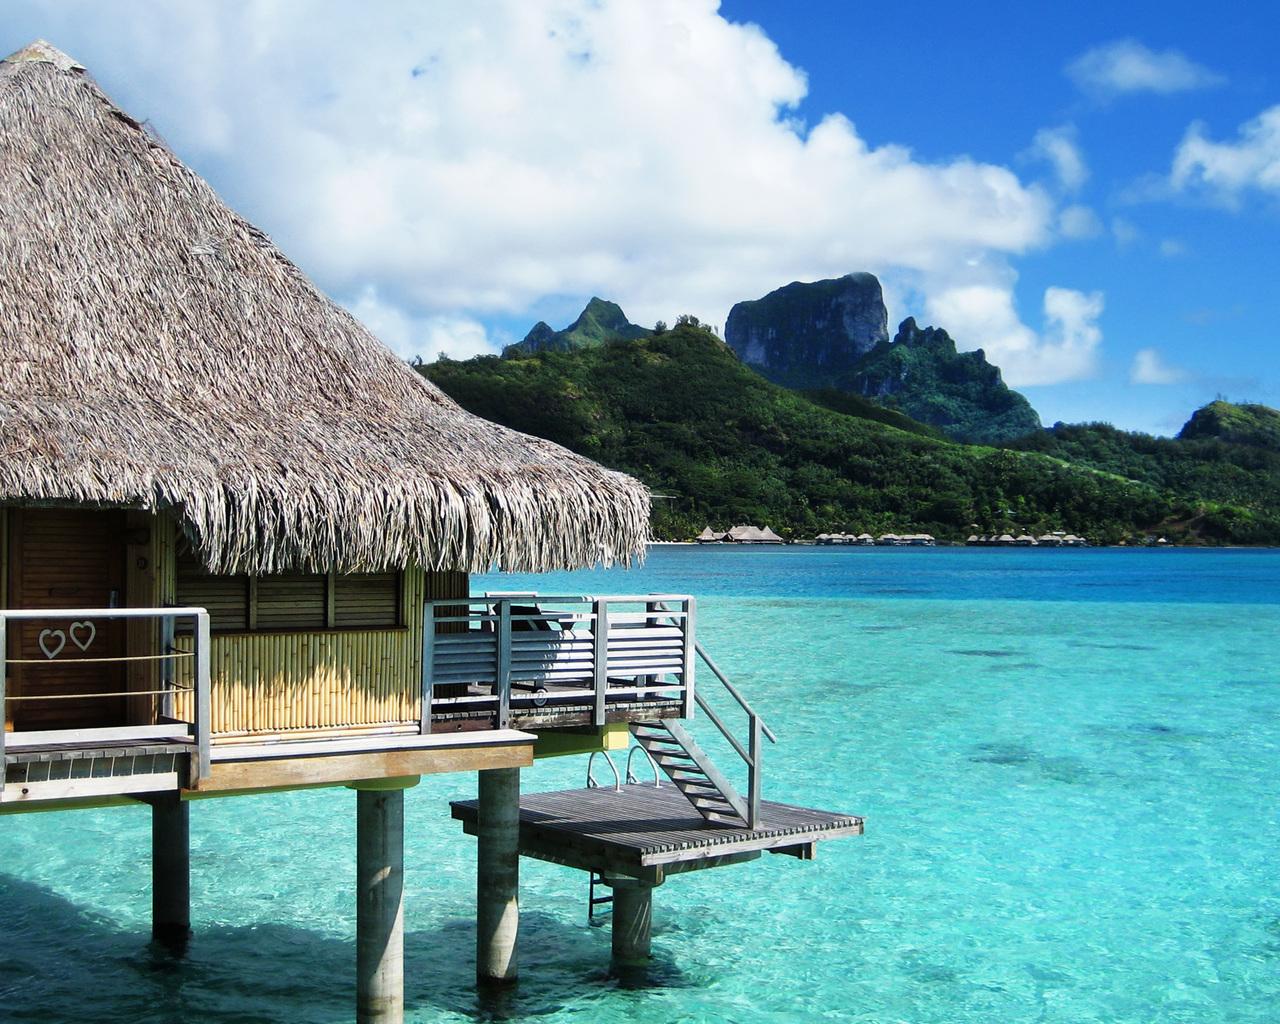 Bora Bora bungalow resort on the beach wallpaper   Beach Wallpapers 1280x1024